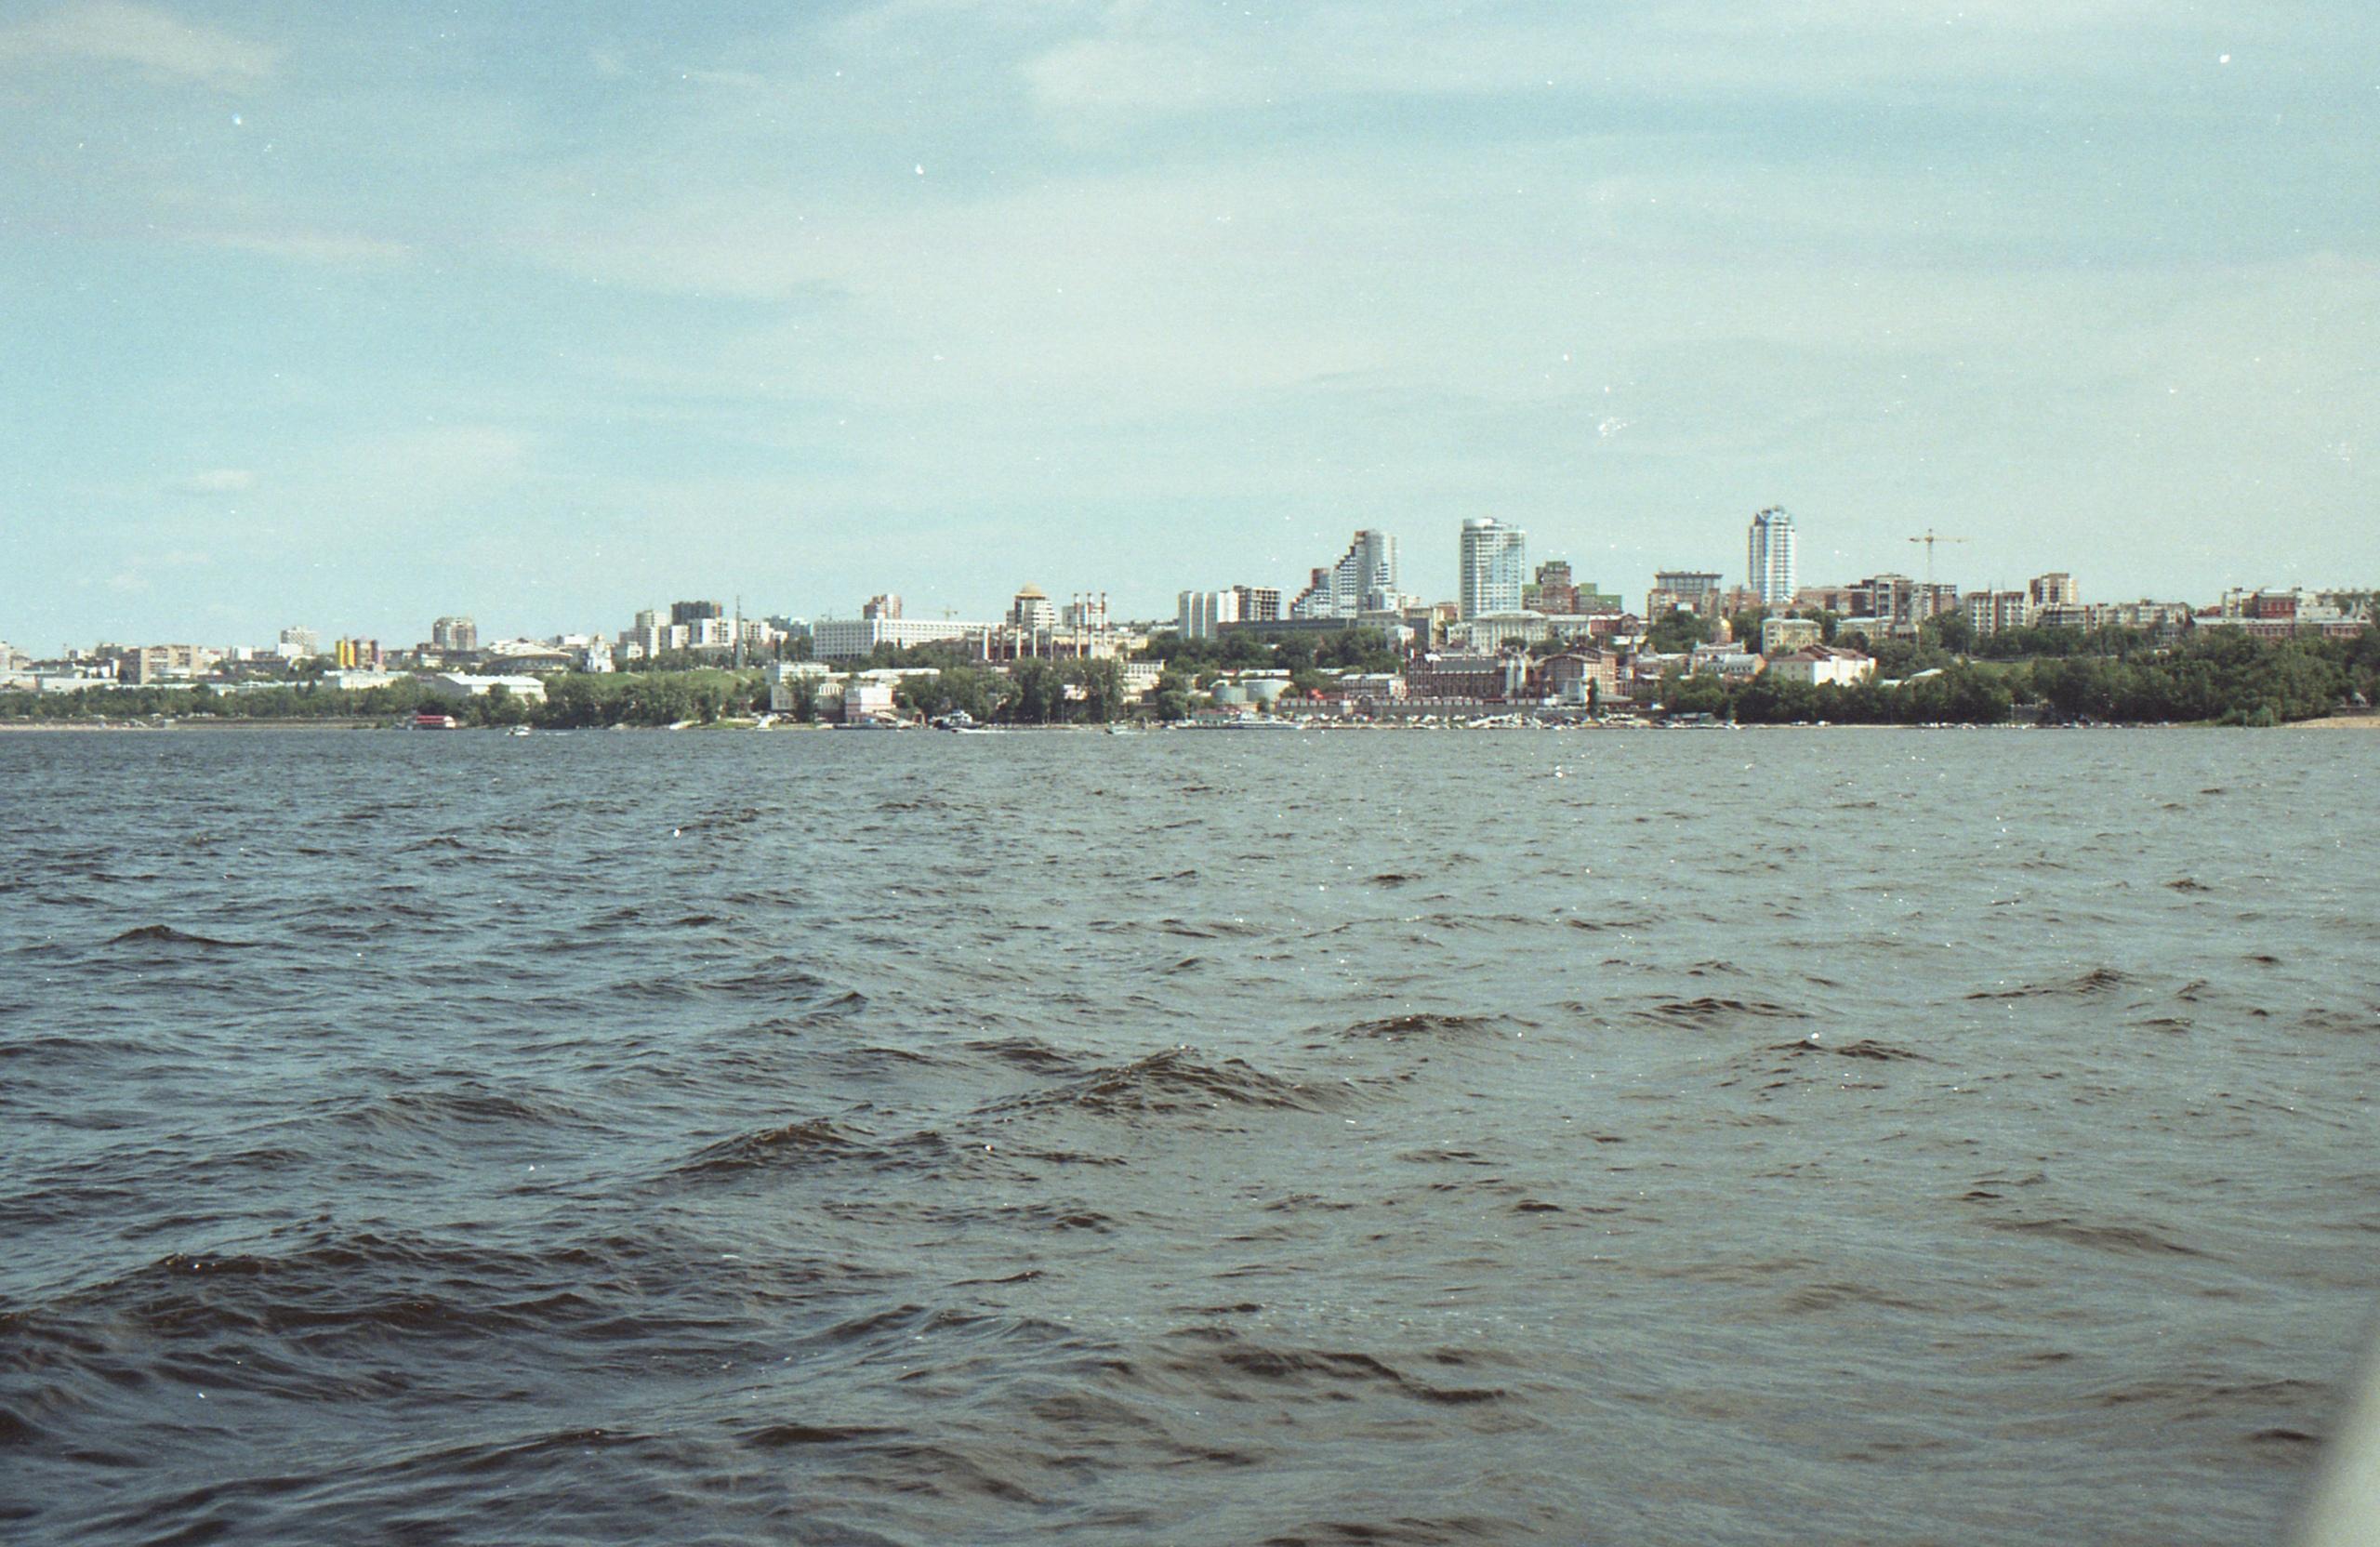 Самара на пленку. Вид с другого берега. Июль 2012г.